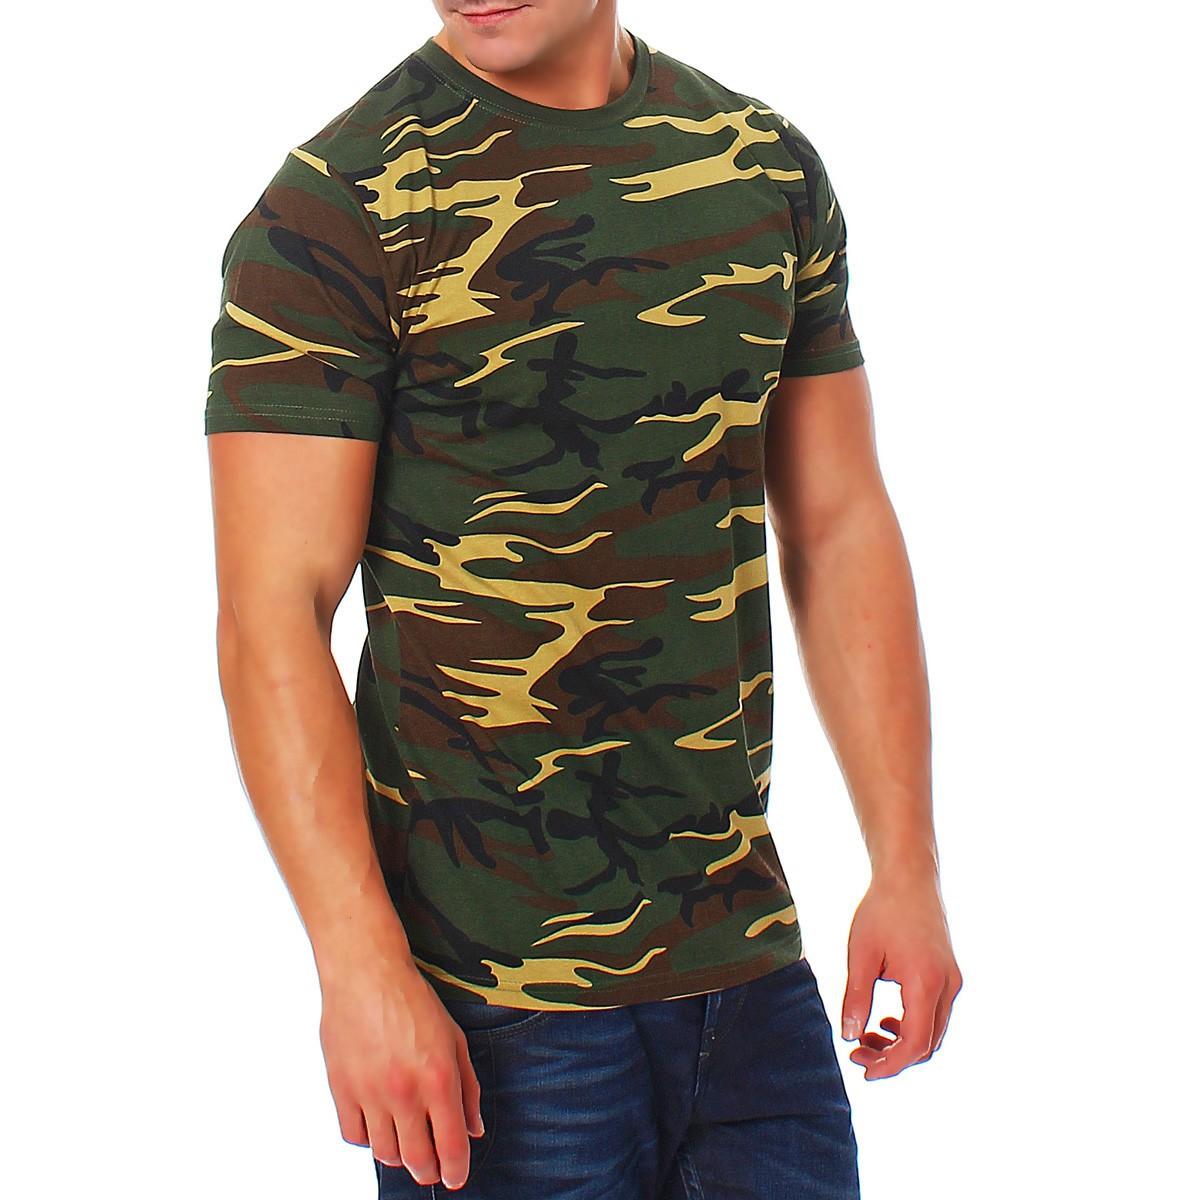 herren camouflage t shirt army military bundeswehr gr n. Black Bedroom Furniture Sets. Home Design Ideas